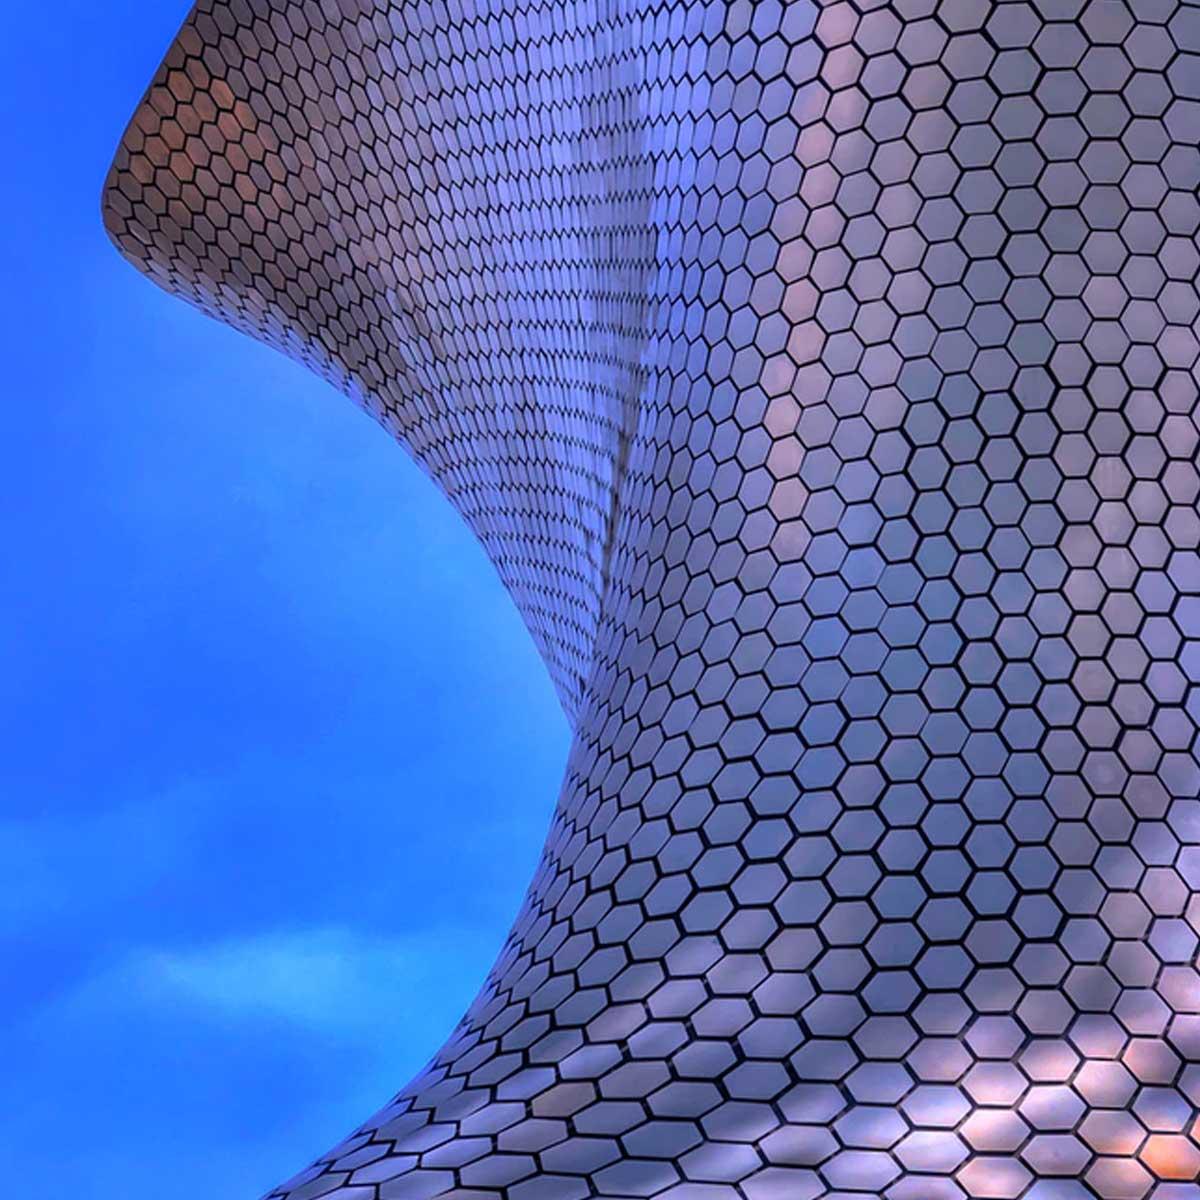 Arquitectura sostenible: Cinco edificios que emulan la naturaleza